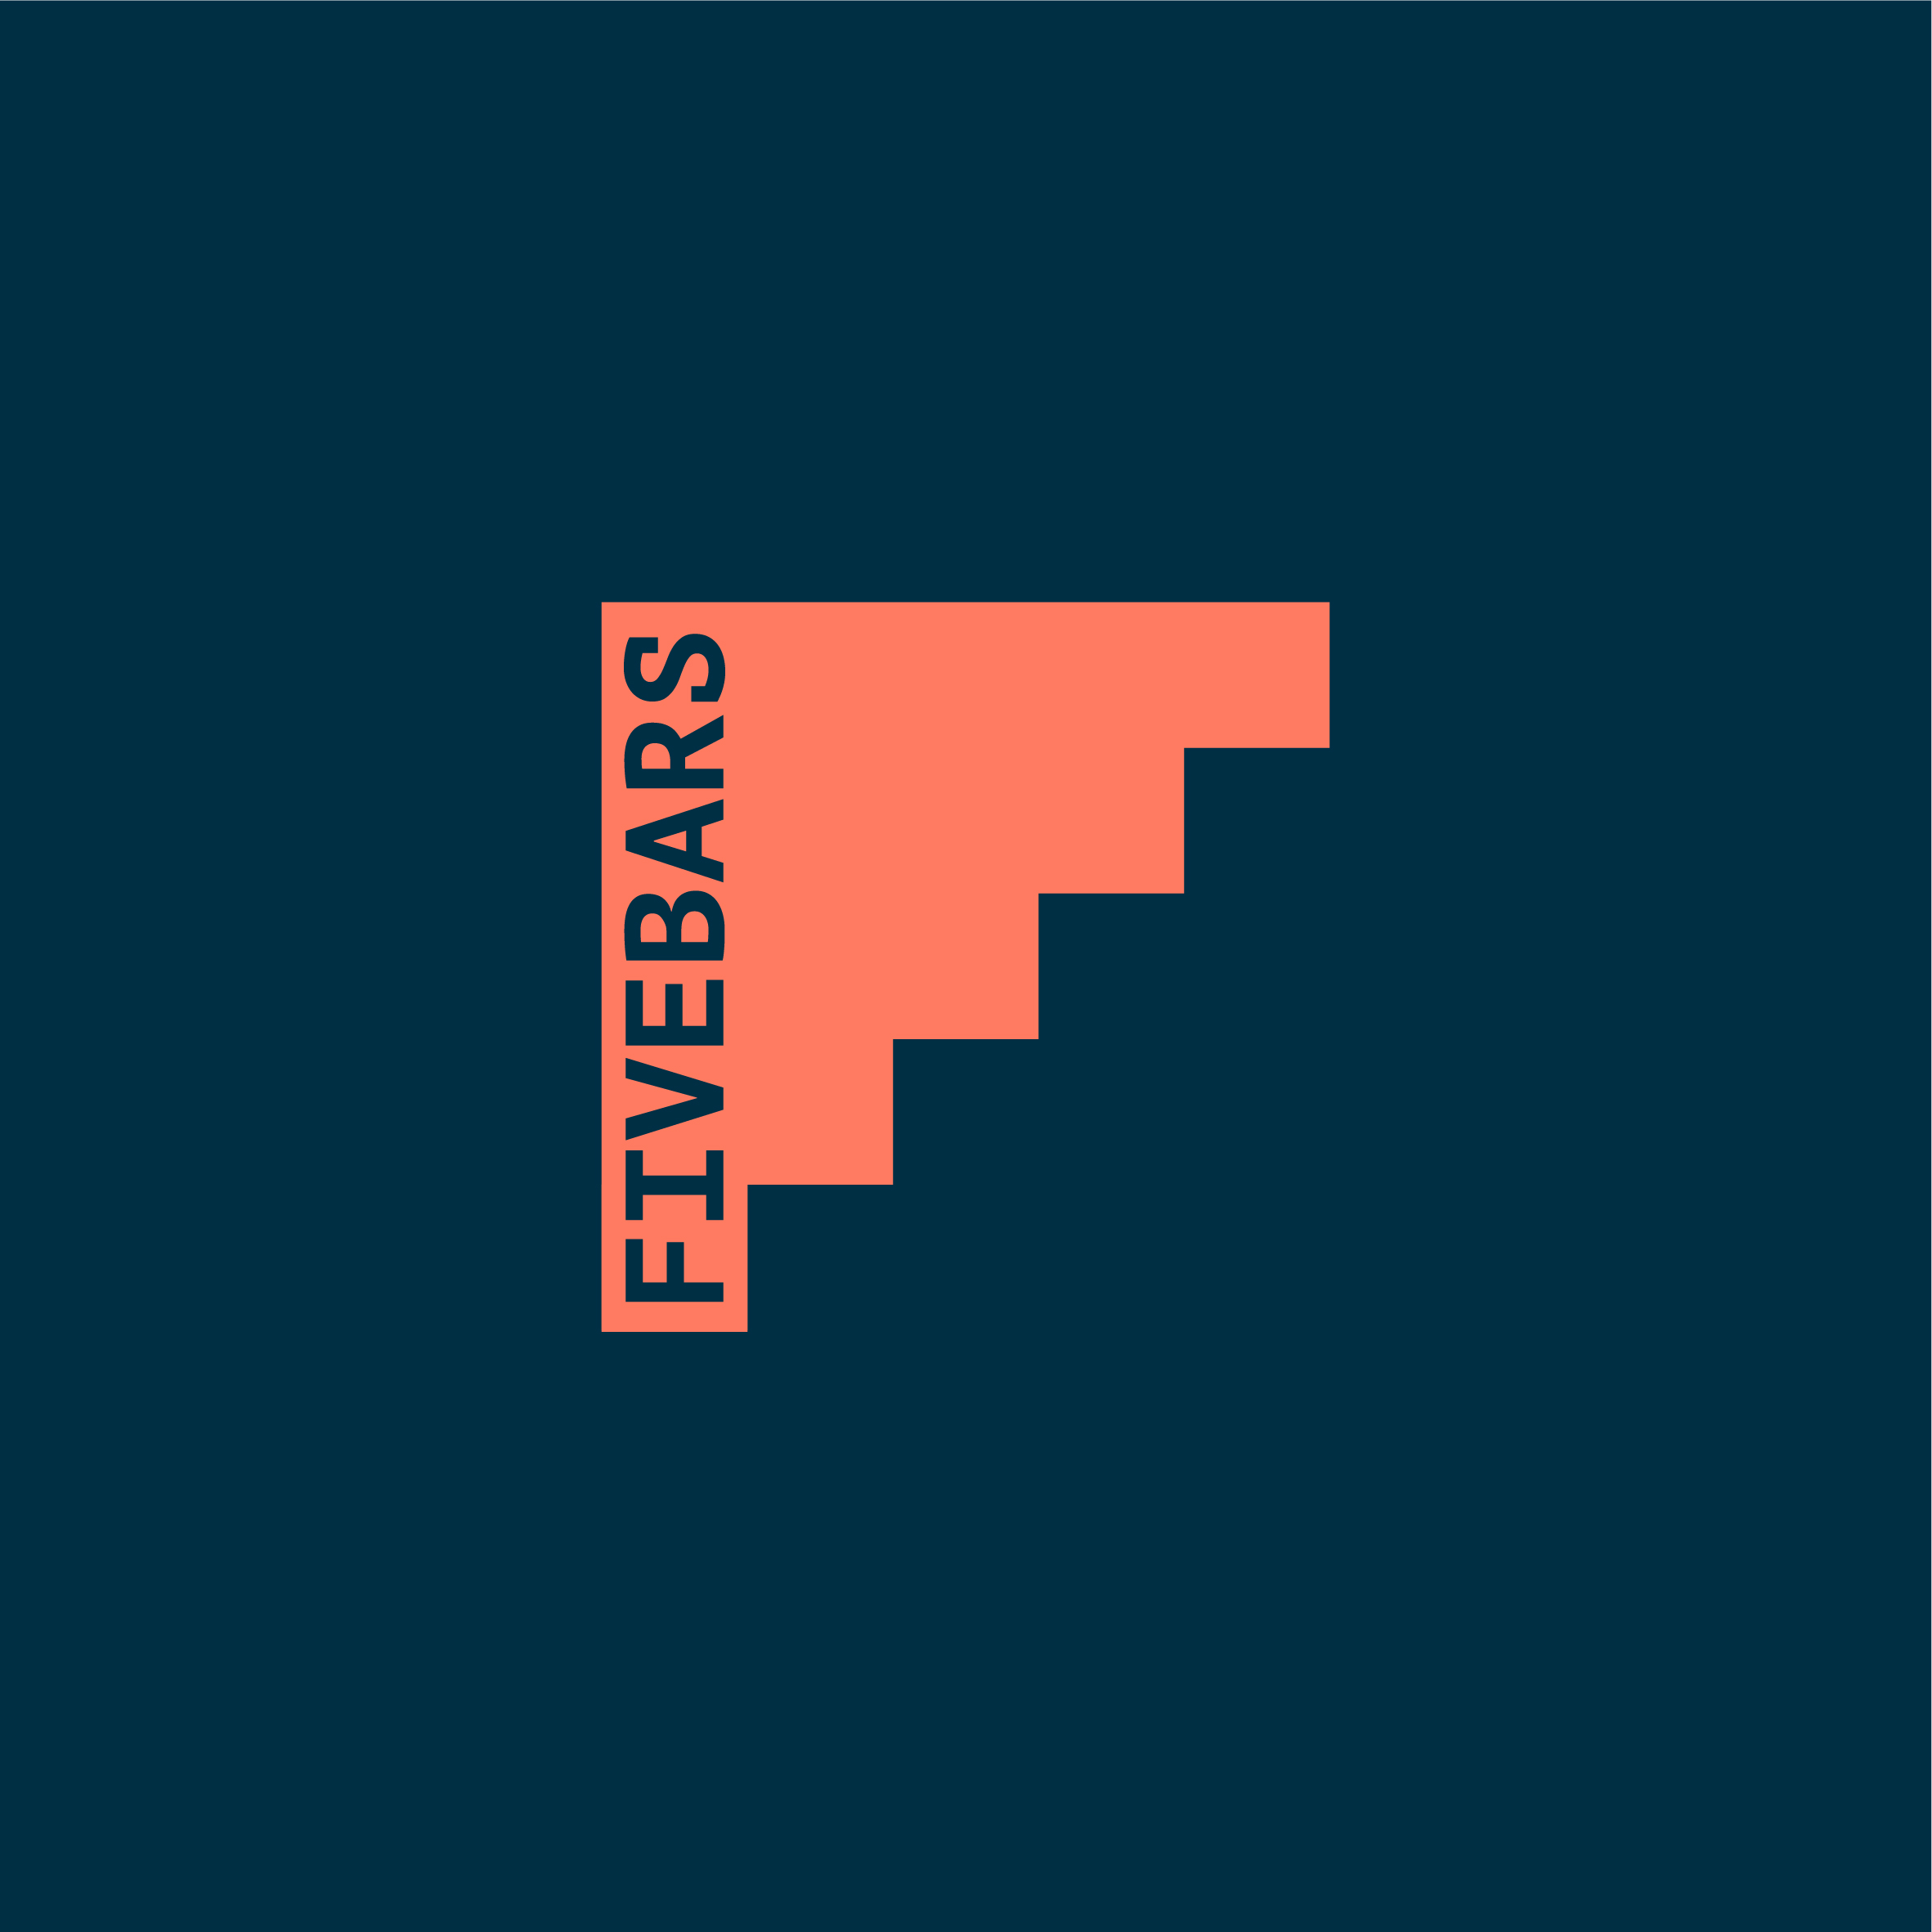 fivebars-03